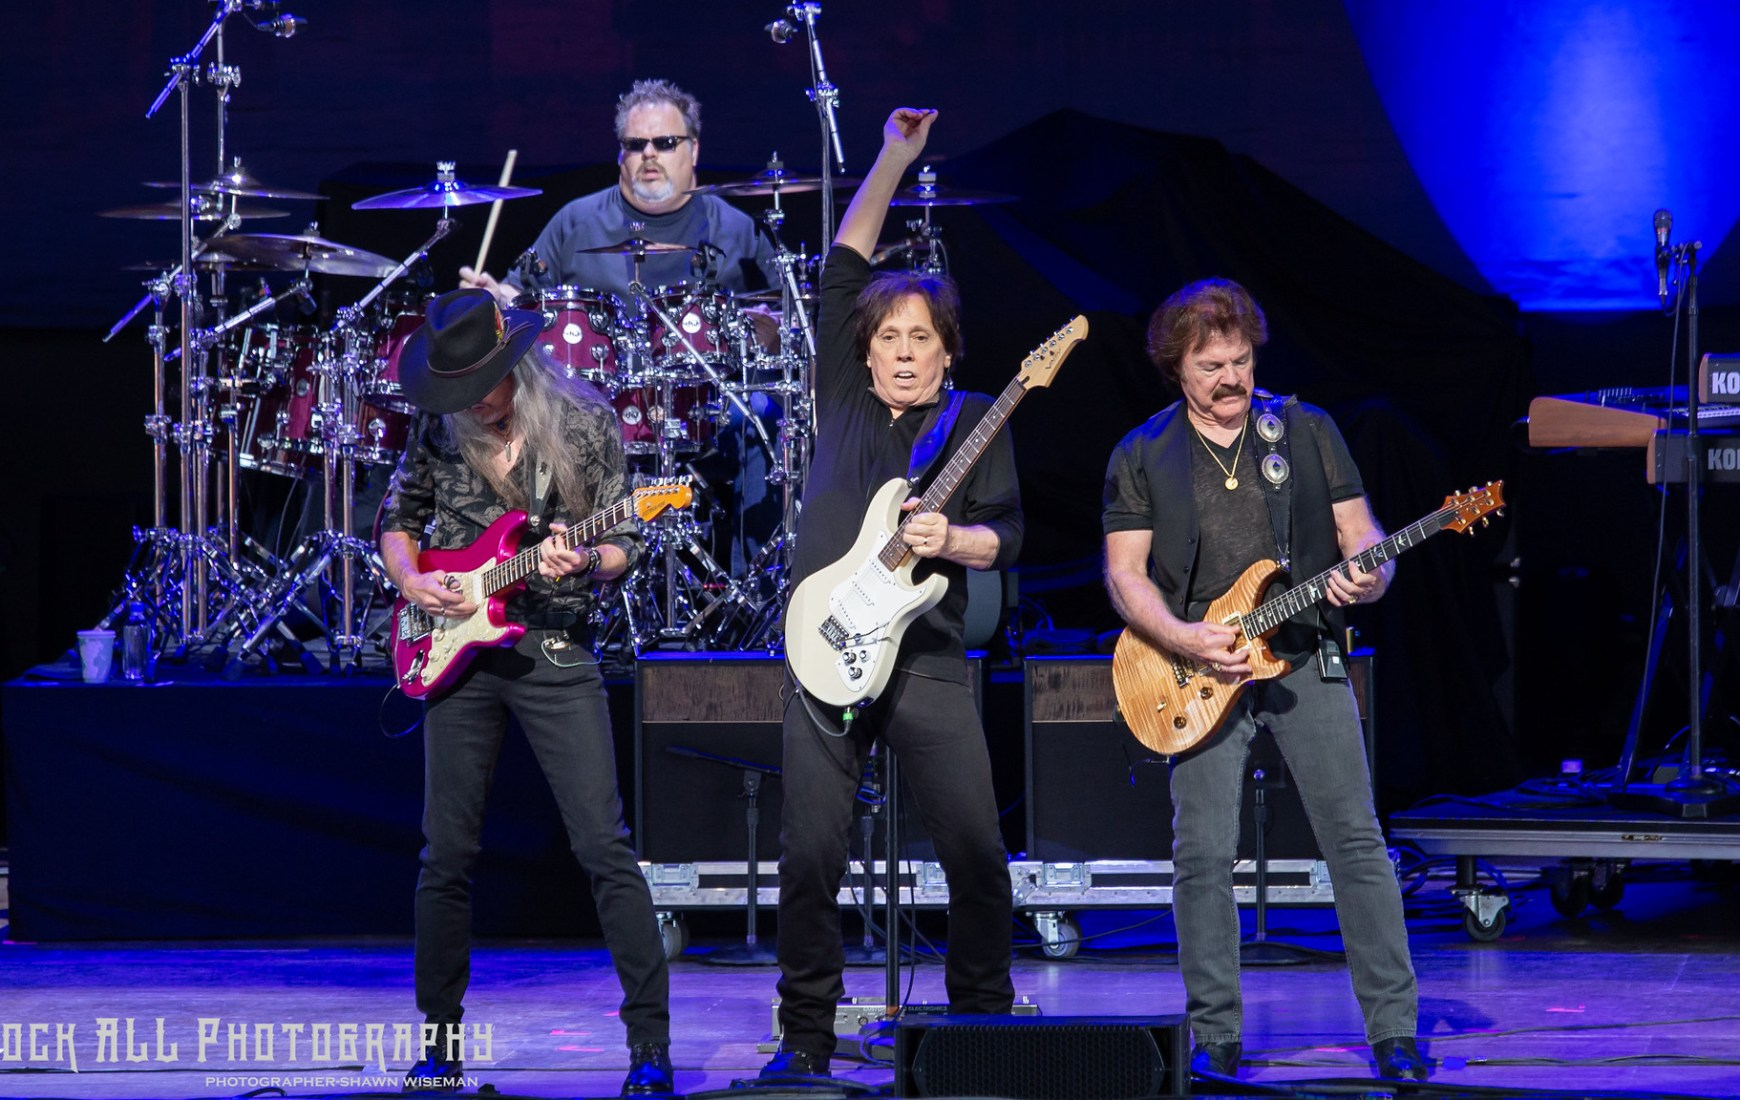 Doobie Brothers - Riverbend Music Center Cincinnati, OH - 6/27/18